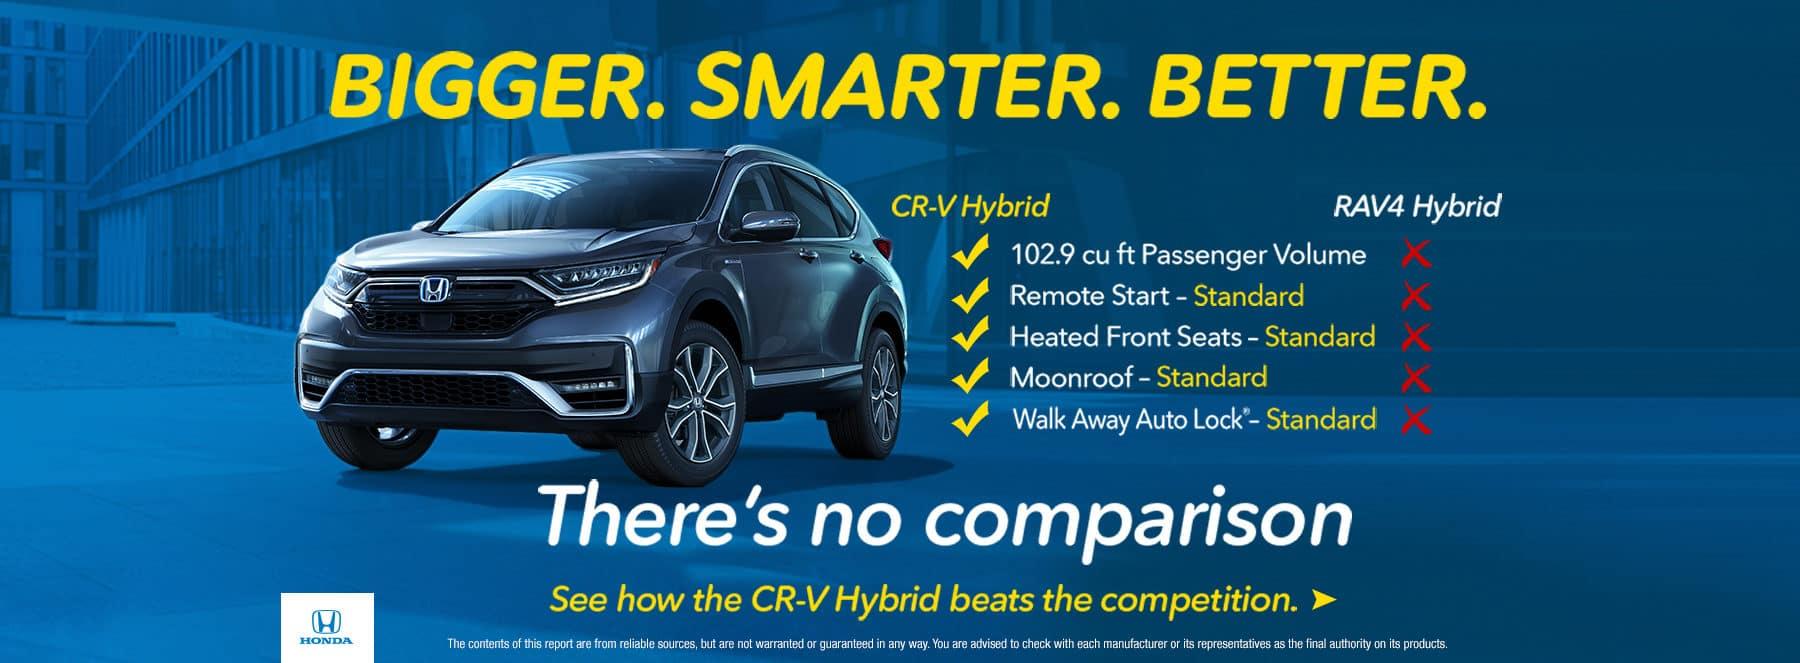 CR-V-Hybrid-Web-Slider2-1800×663-webslider